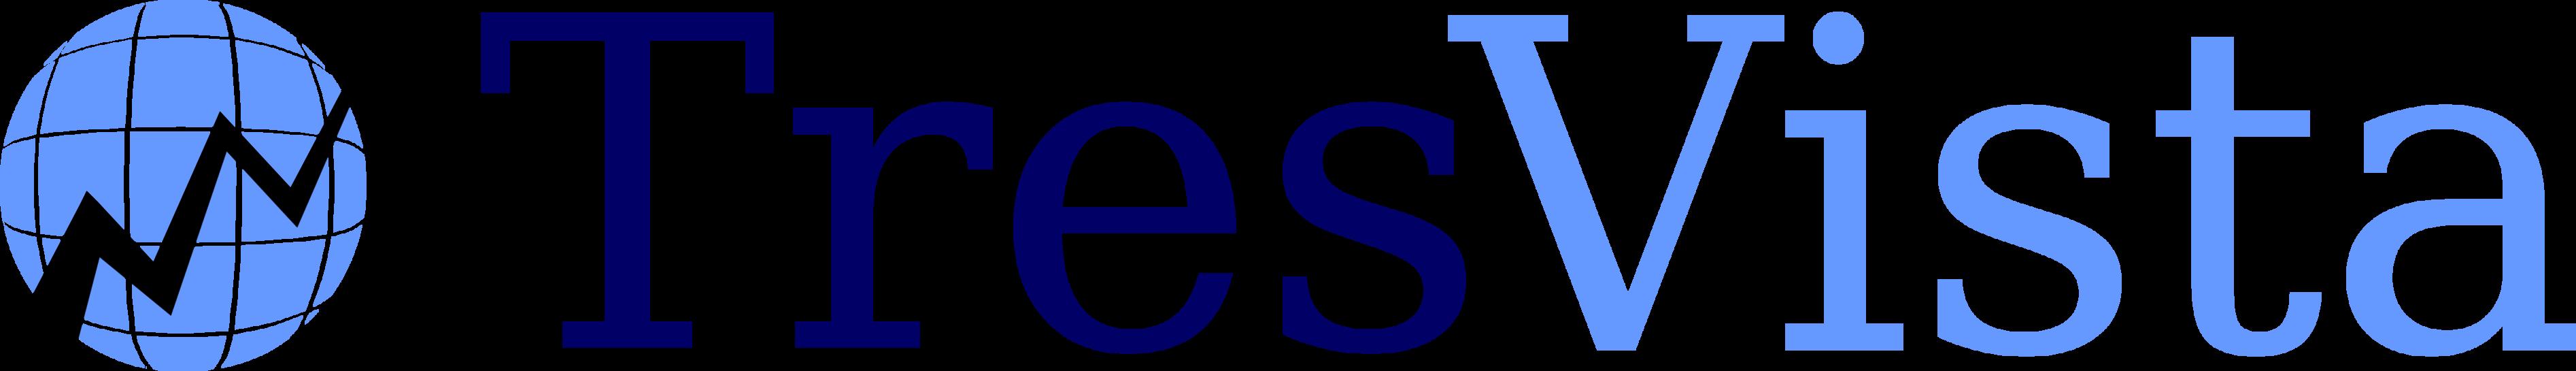 https://www.acg.org/sites/files/Winston_logo_200x114.png